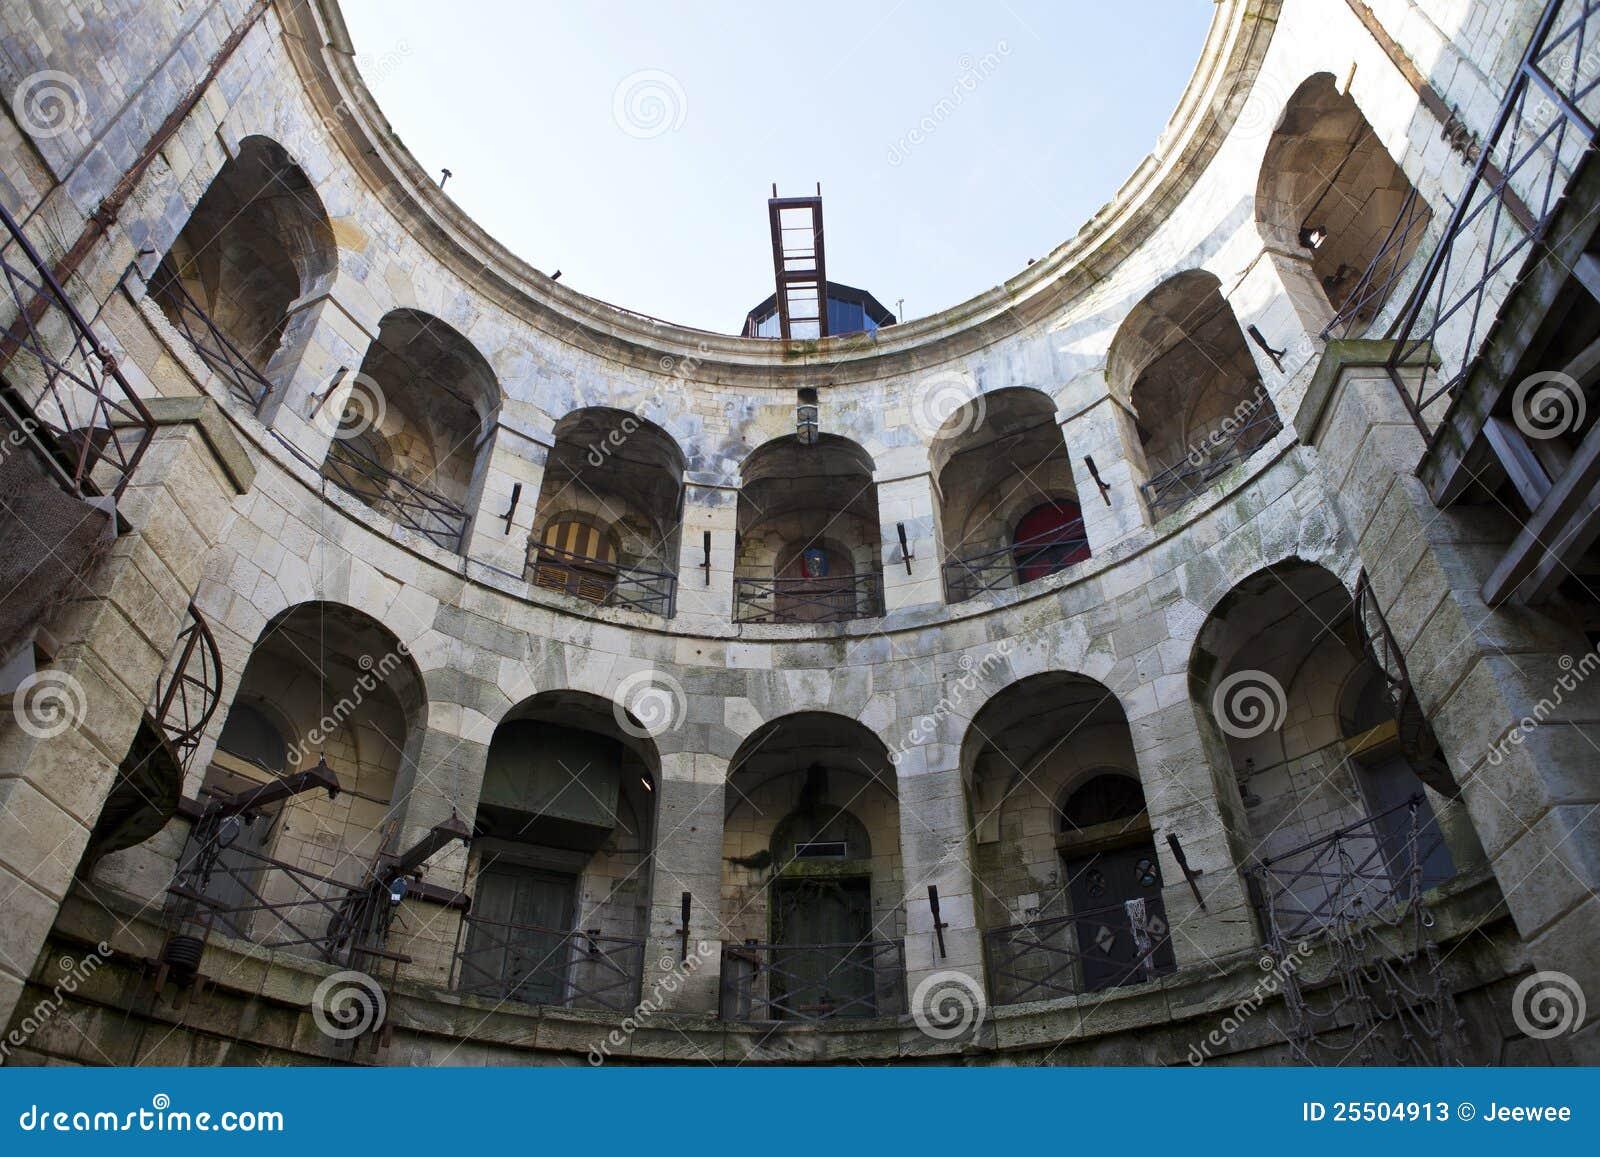 Fort boyard int rieur france photos stock image 25504913 for Interieur francais